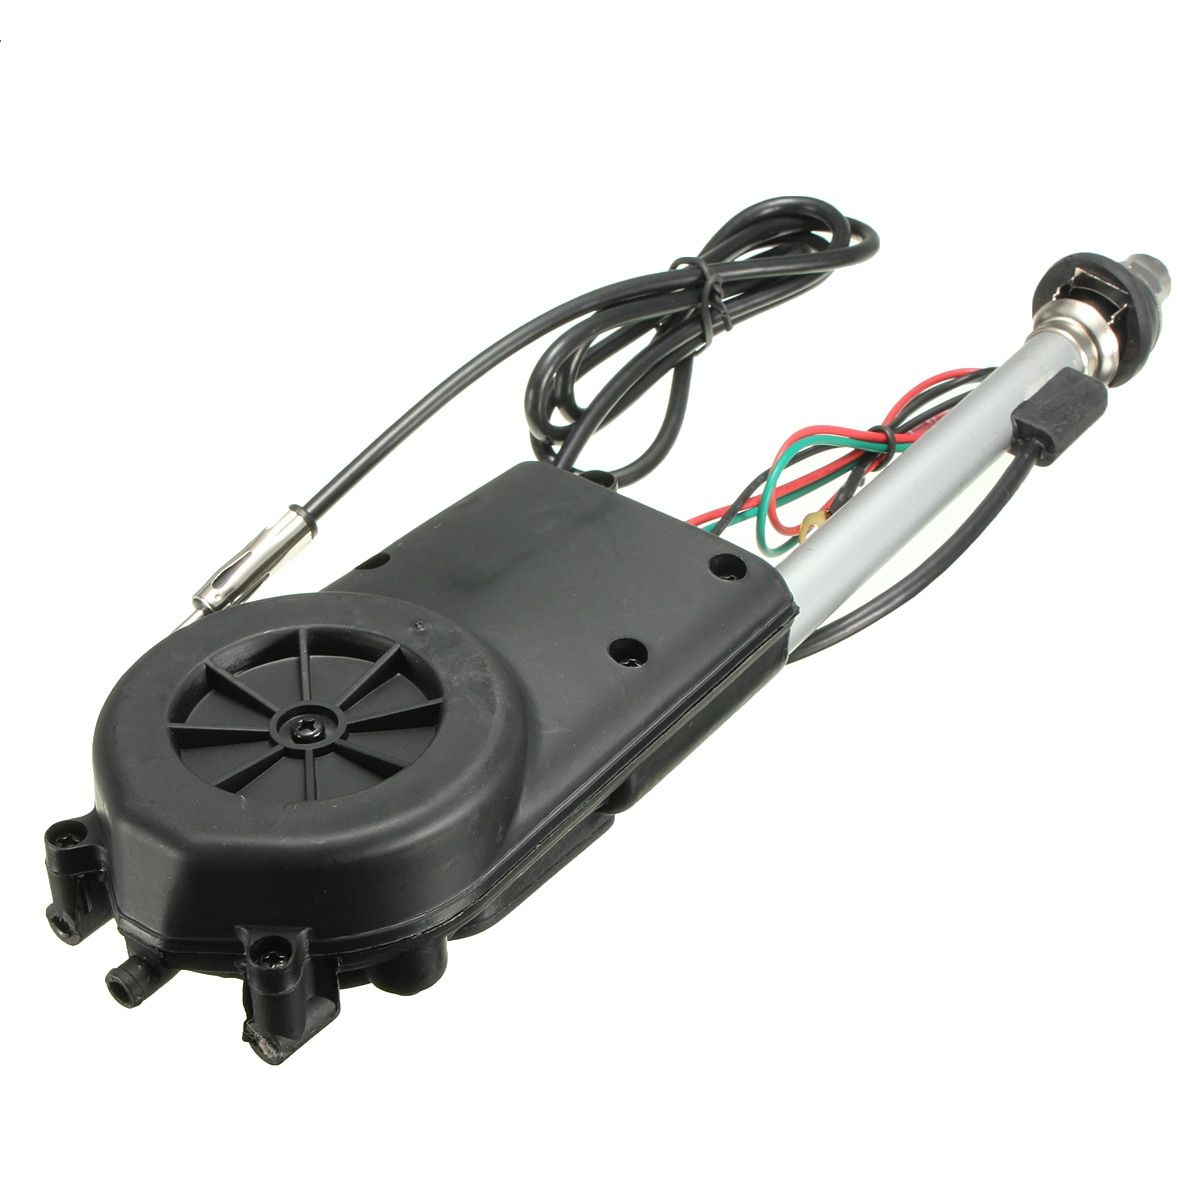 Universal Auto Car Electric Power Aerial Automatic Antenna Vehicle Mast AM FM Radio